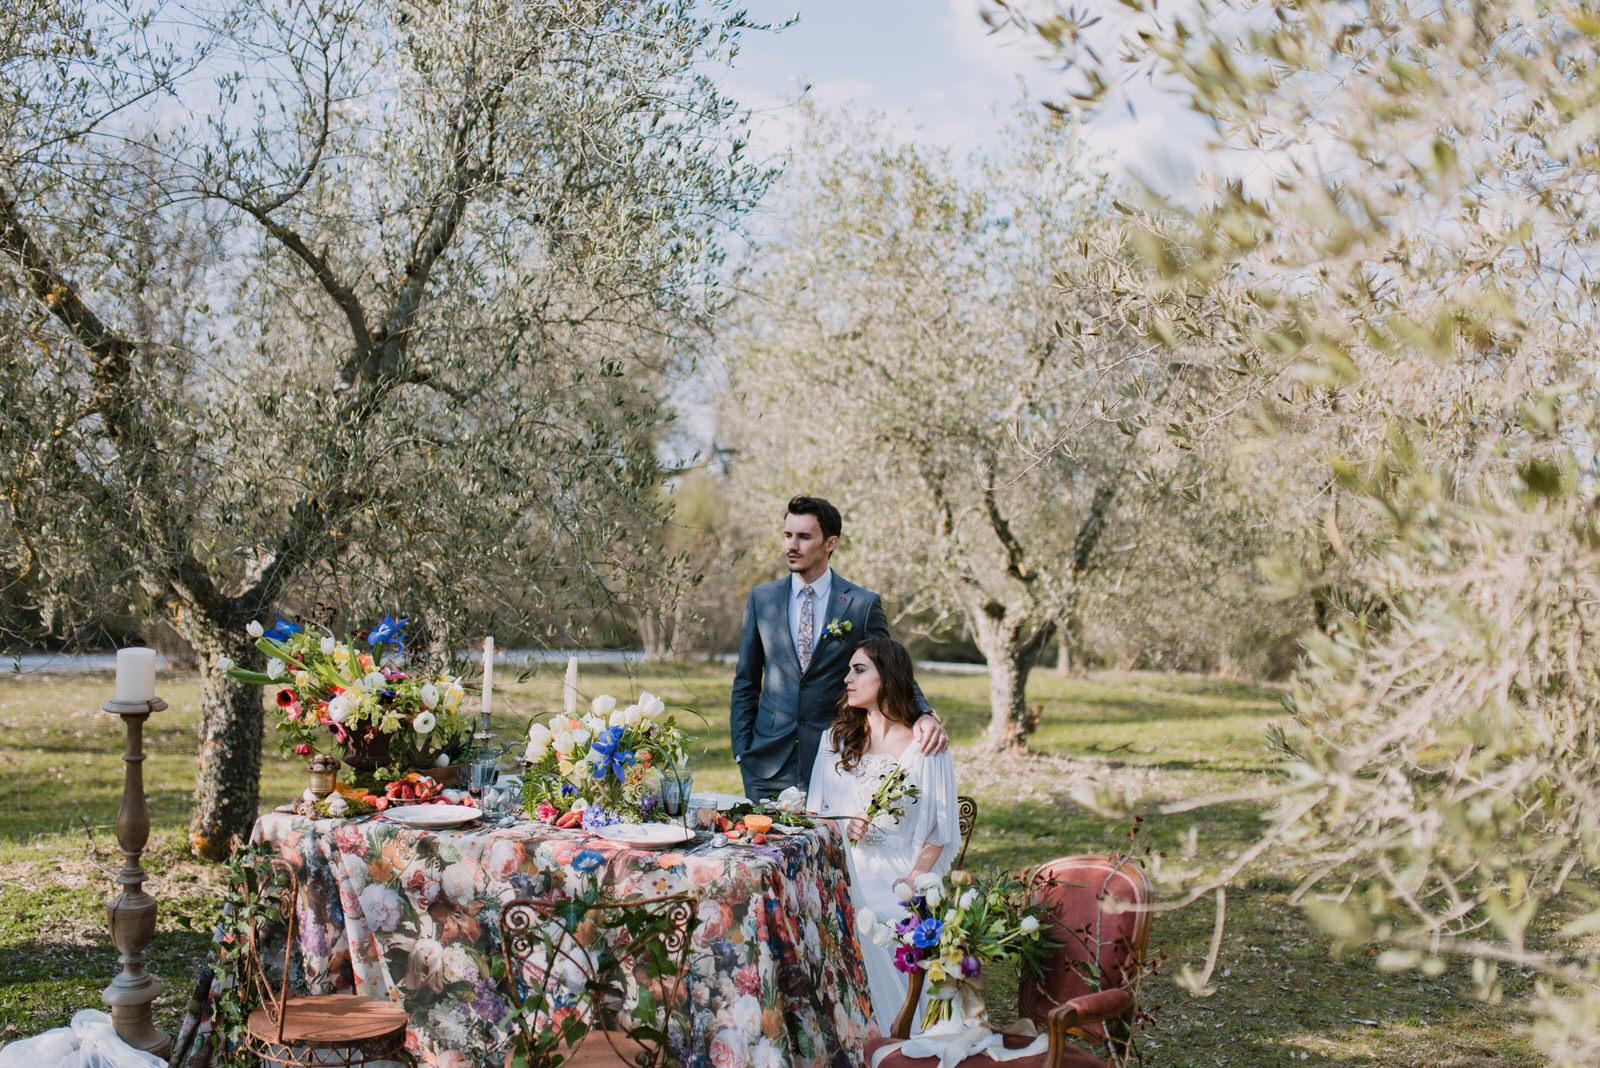 tuscany wedding photography 37.jpg